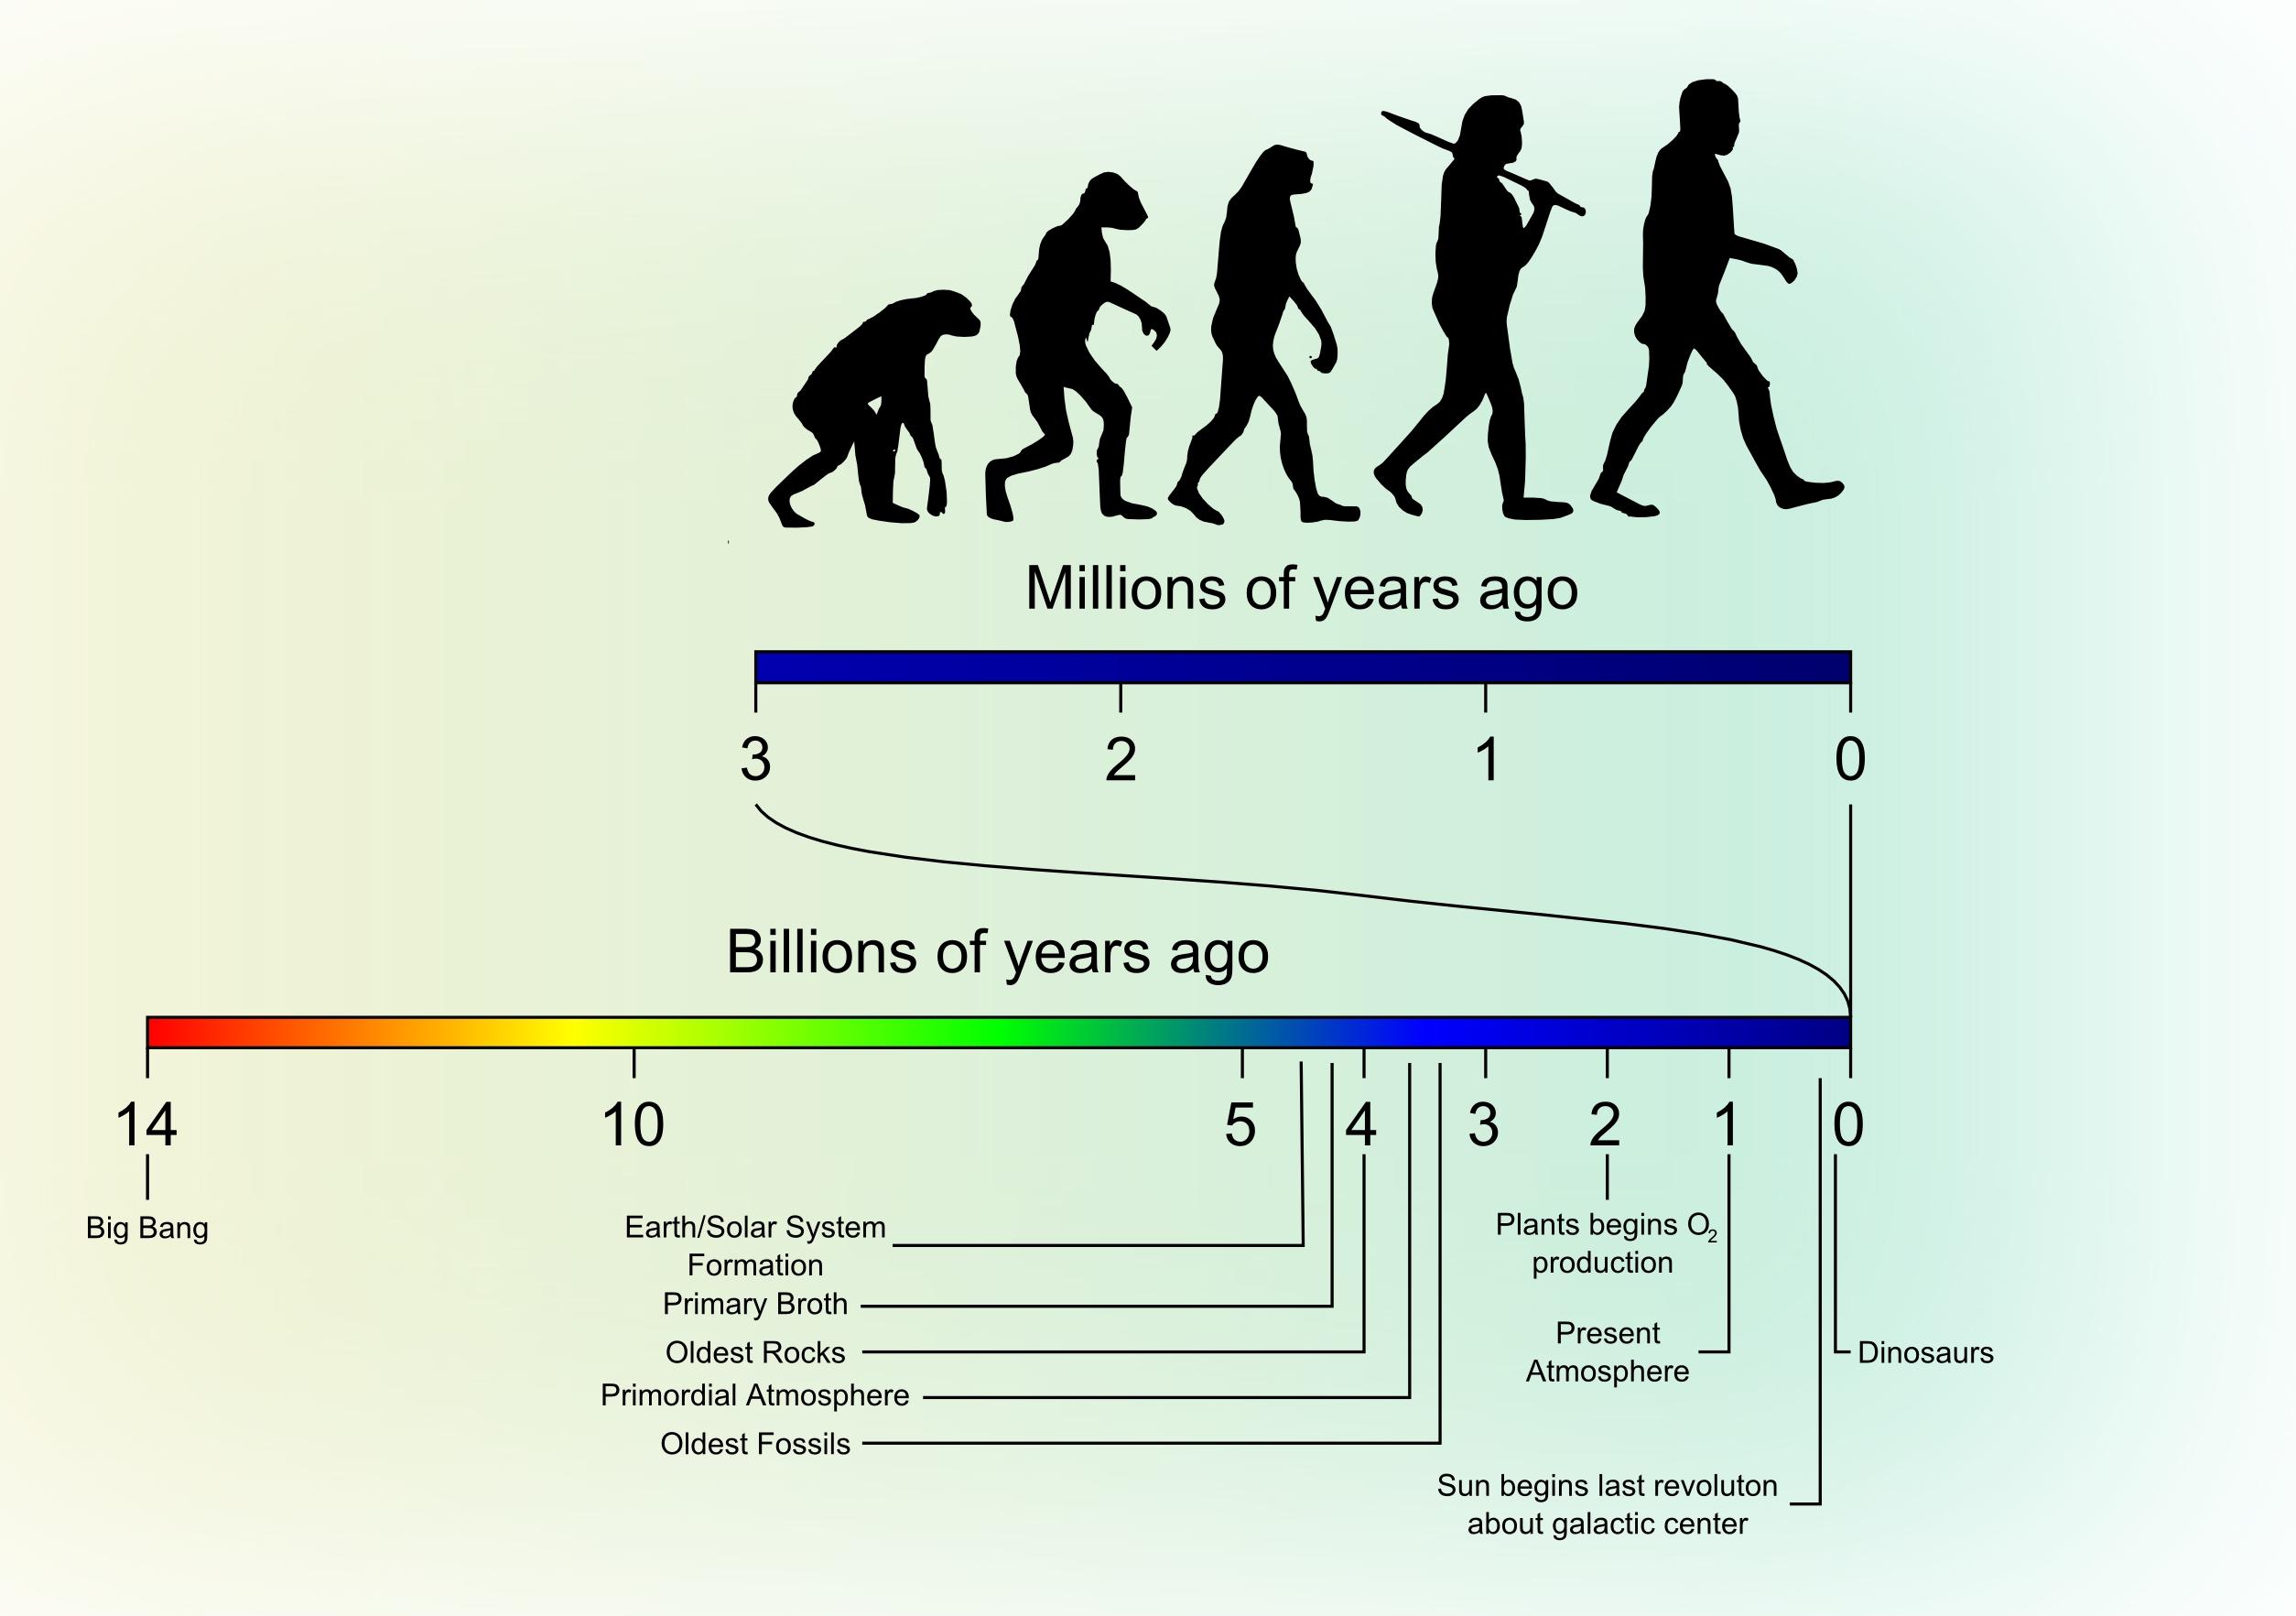 Universe_vs_Human_timescale